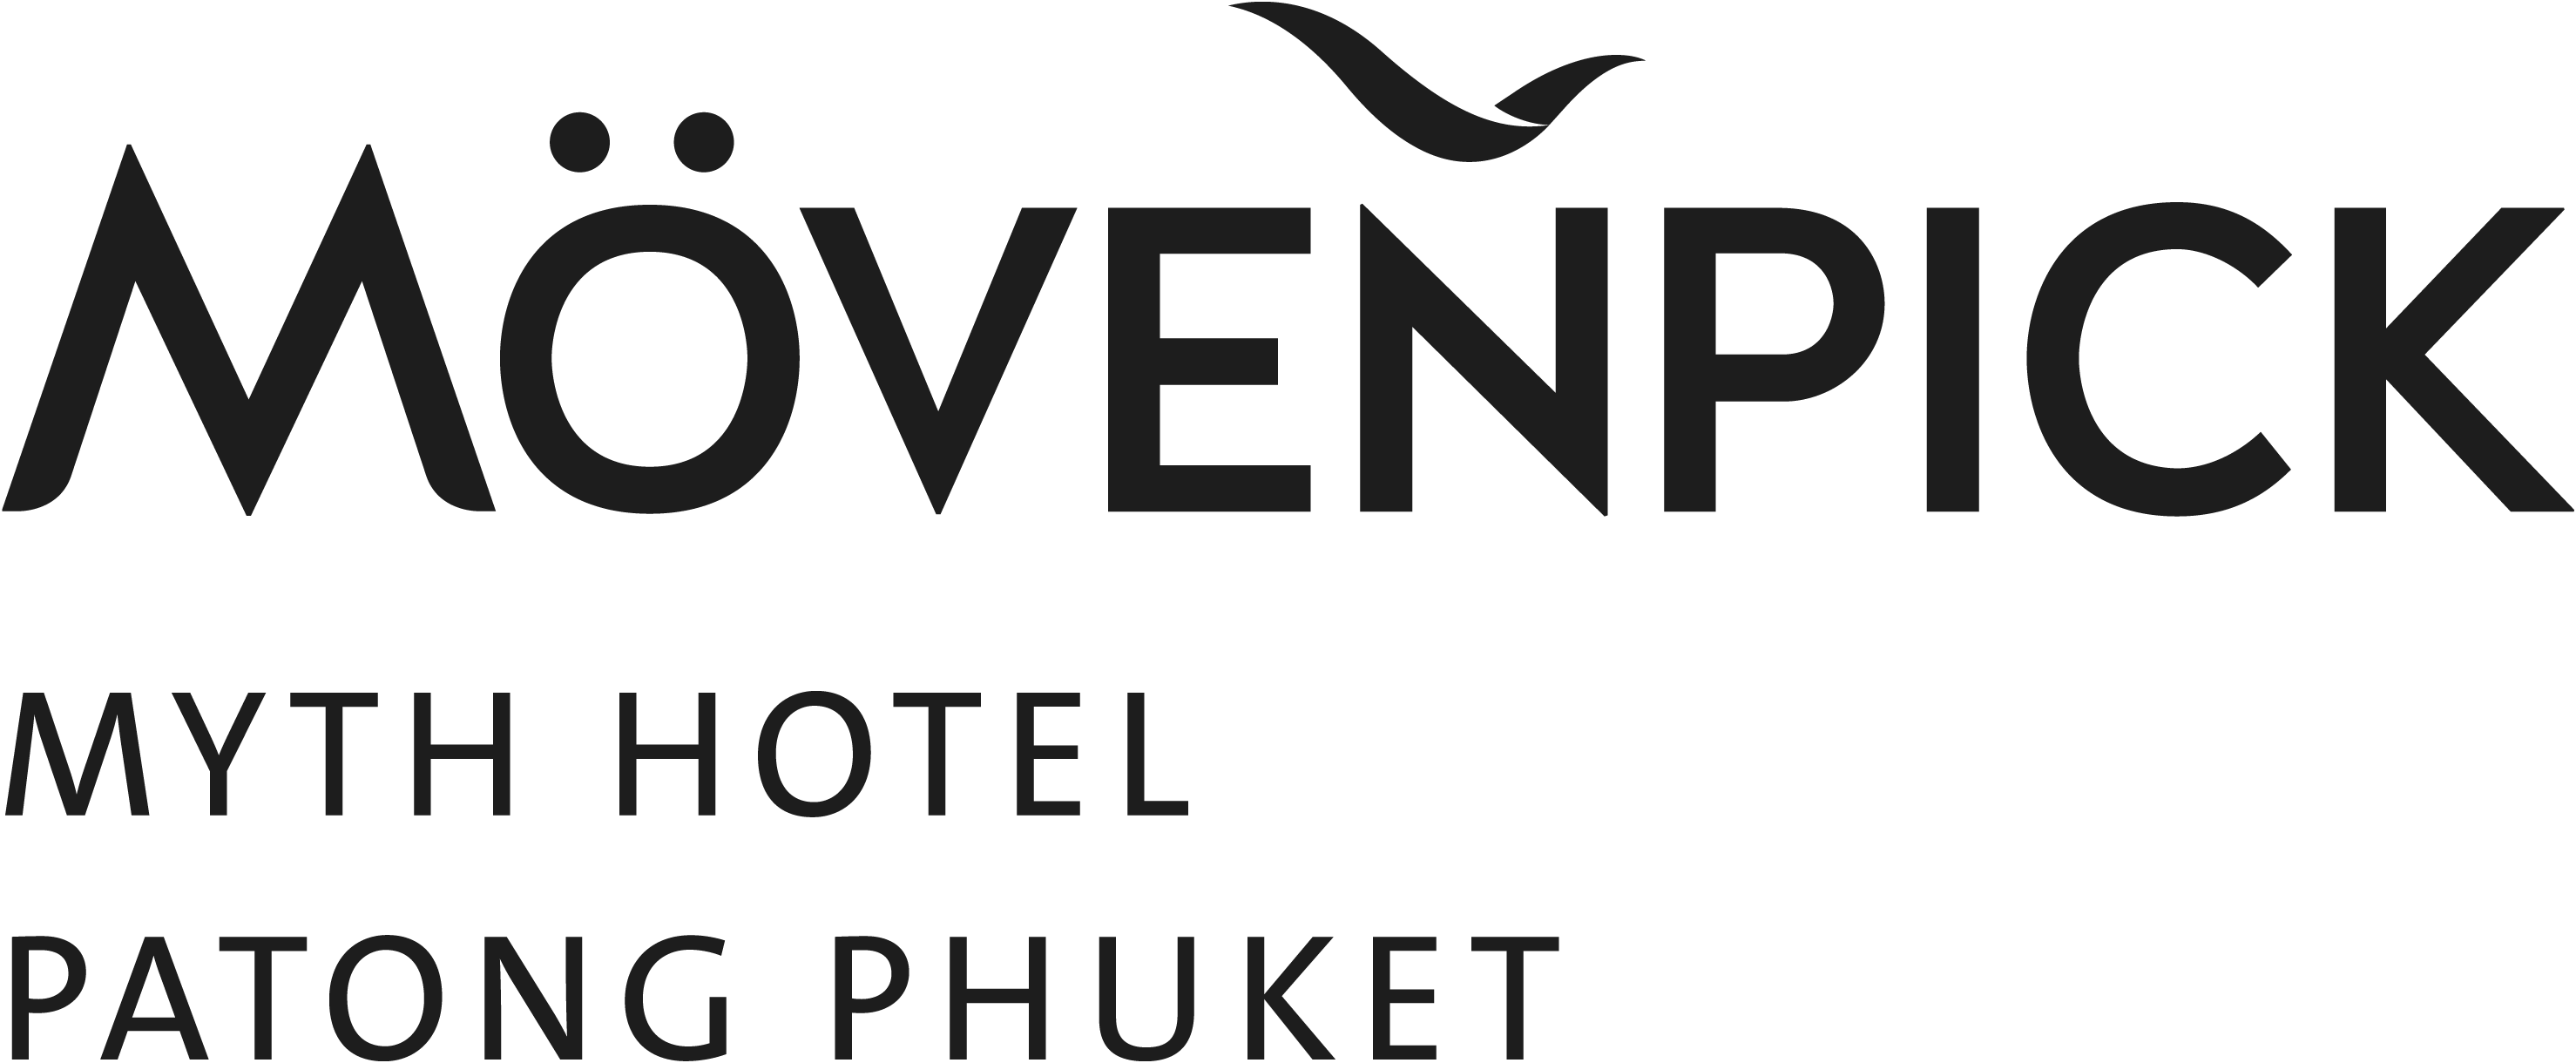 Movenpick Myth Hotel Patong Phuket.